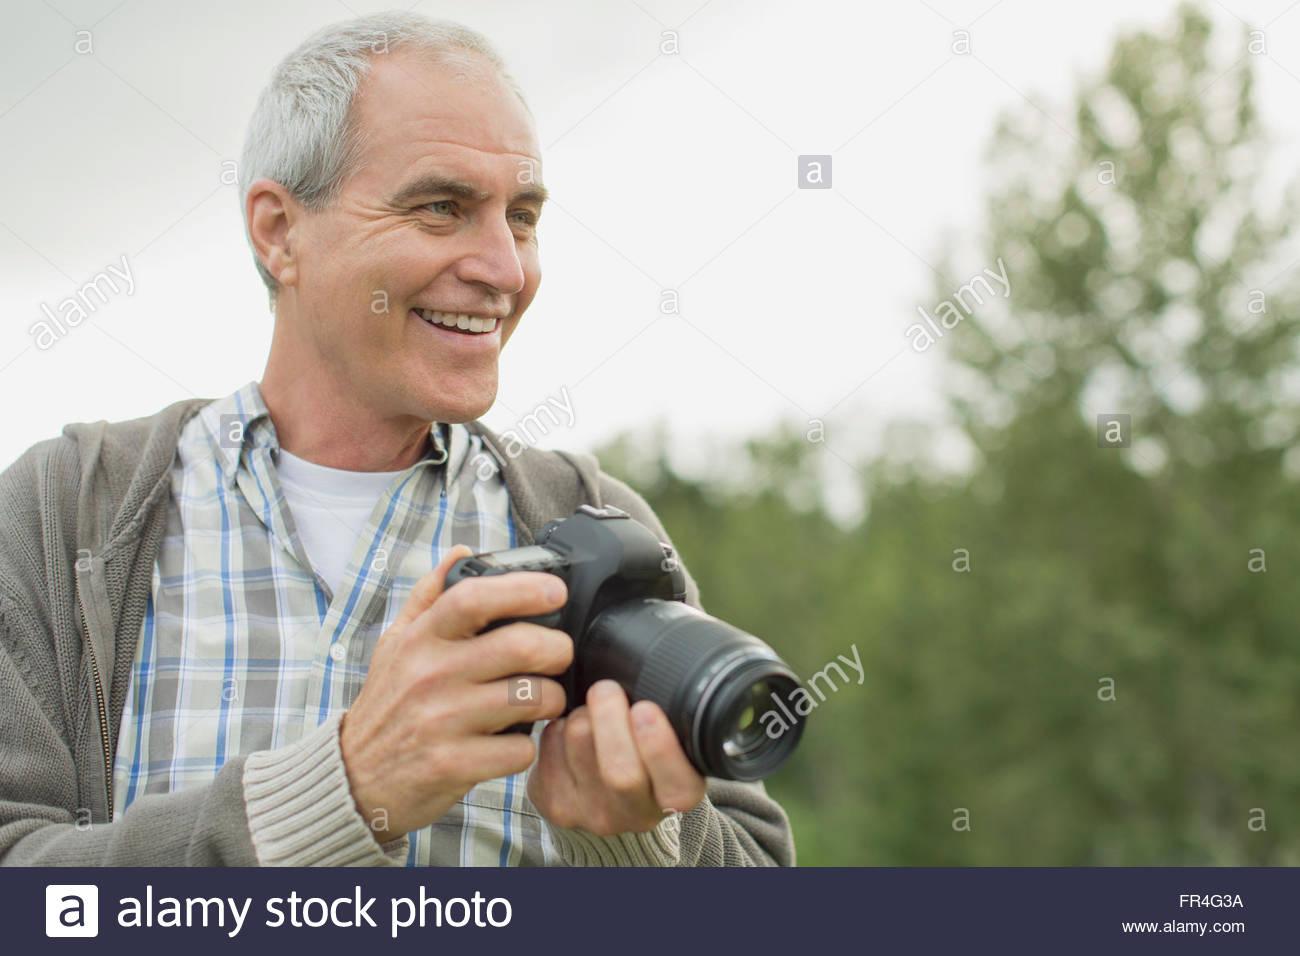 Middle-aged man smiling pendant le tournage avec caméra. Photo Stock